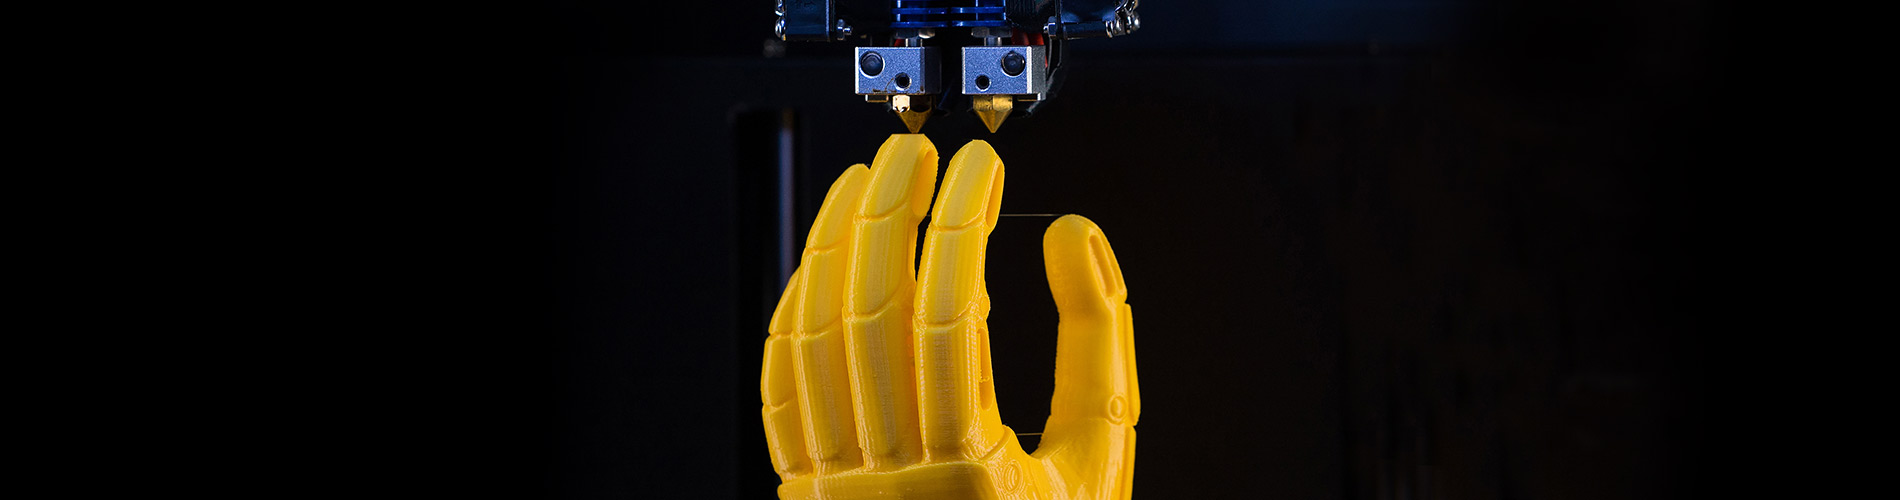 Photo of robotic hand